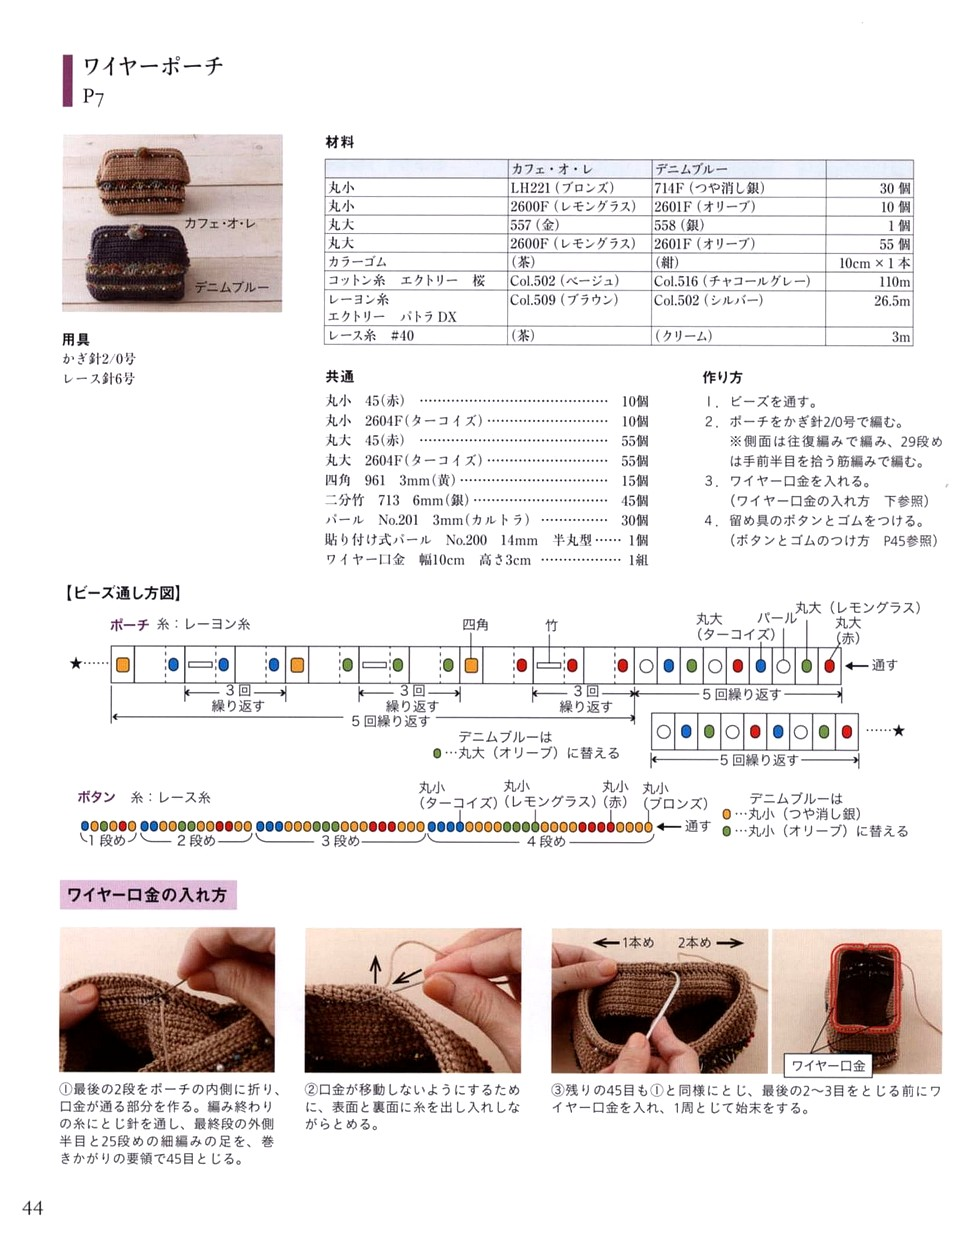 717 Beads Crochet 17-45